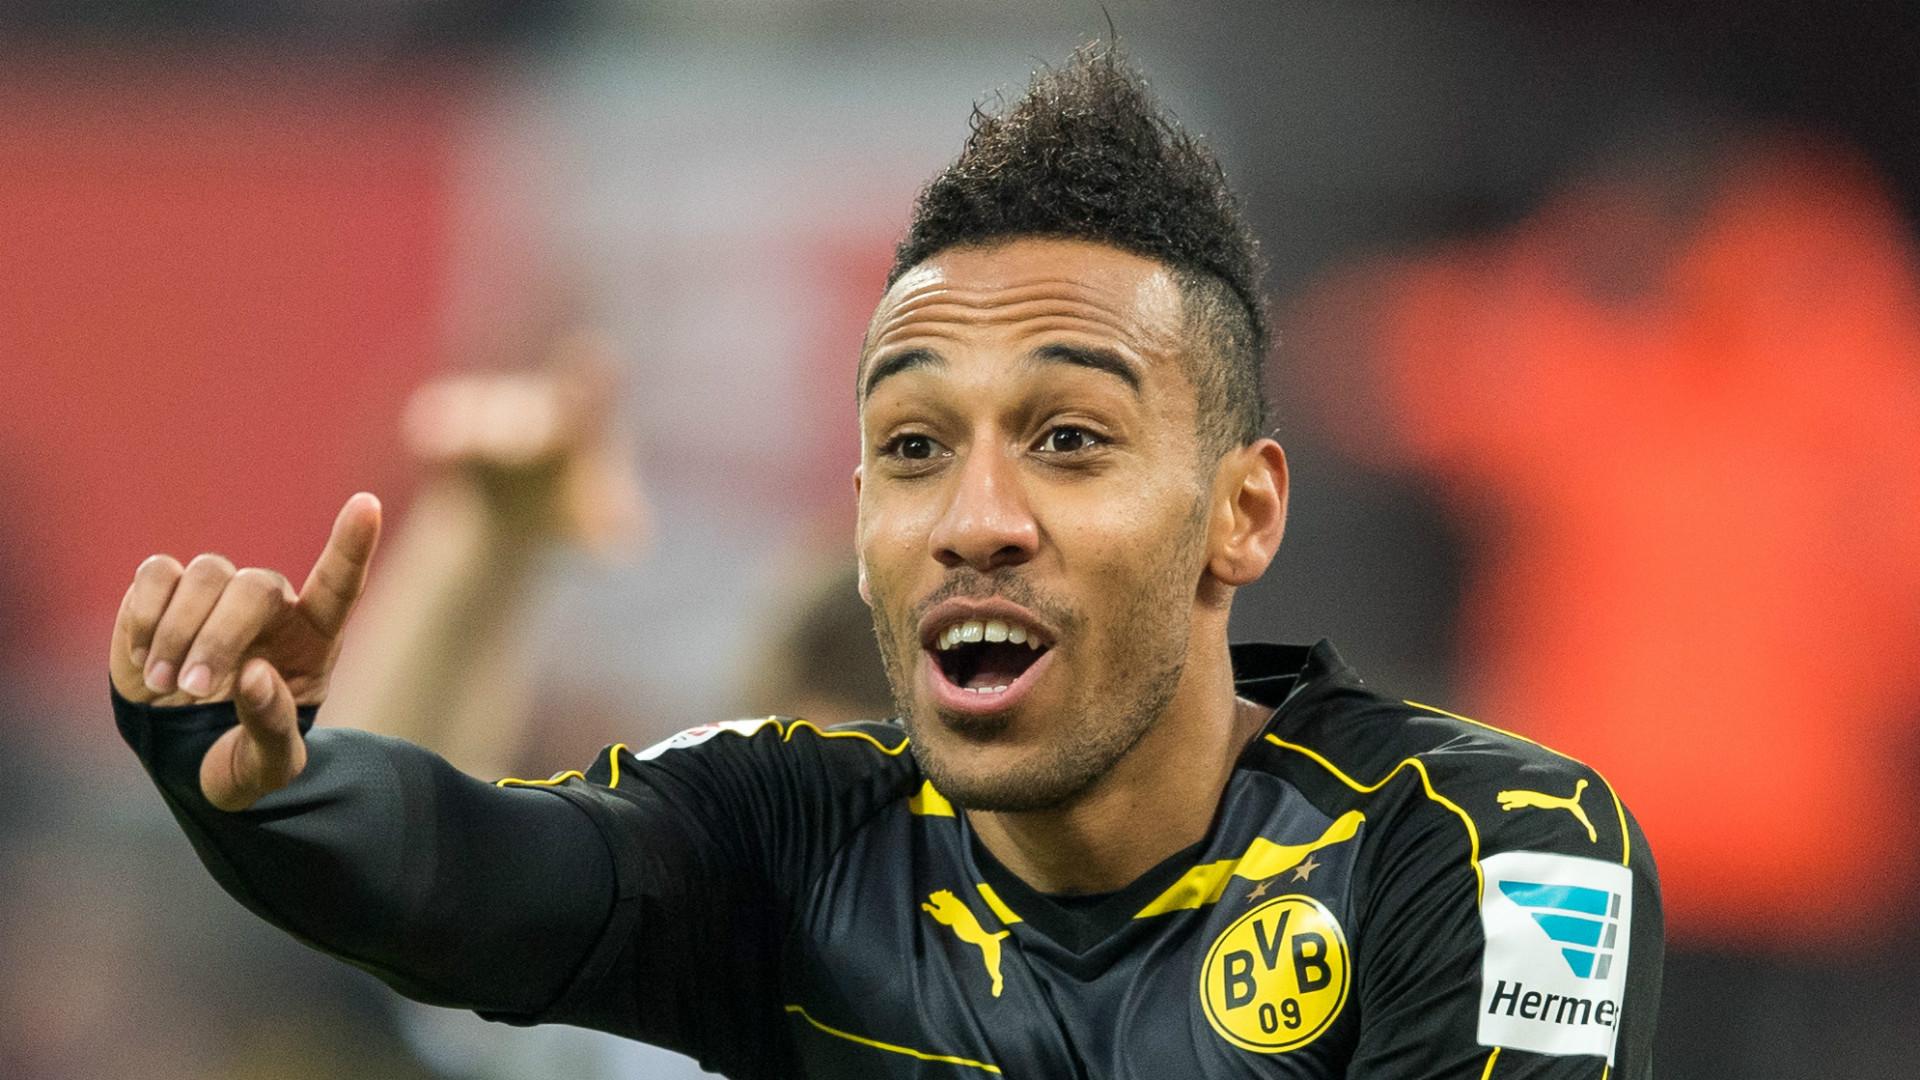 HD Pierre-Emerick Aubameyang Borussia Dortmund